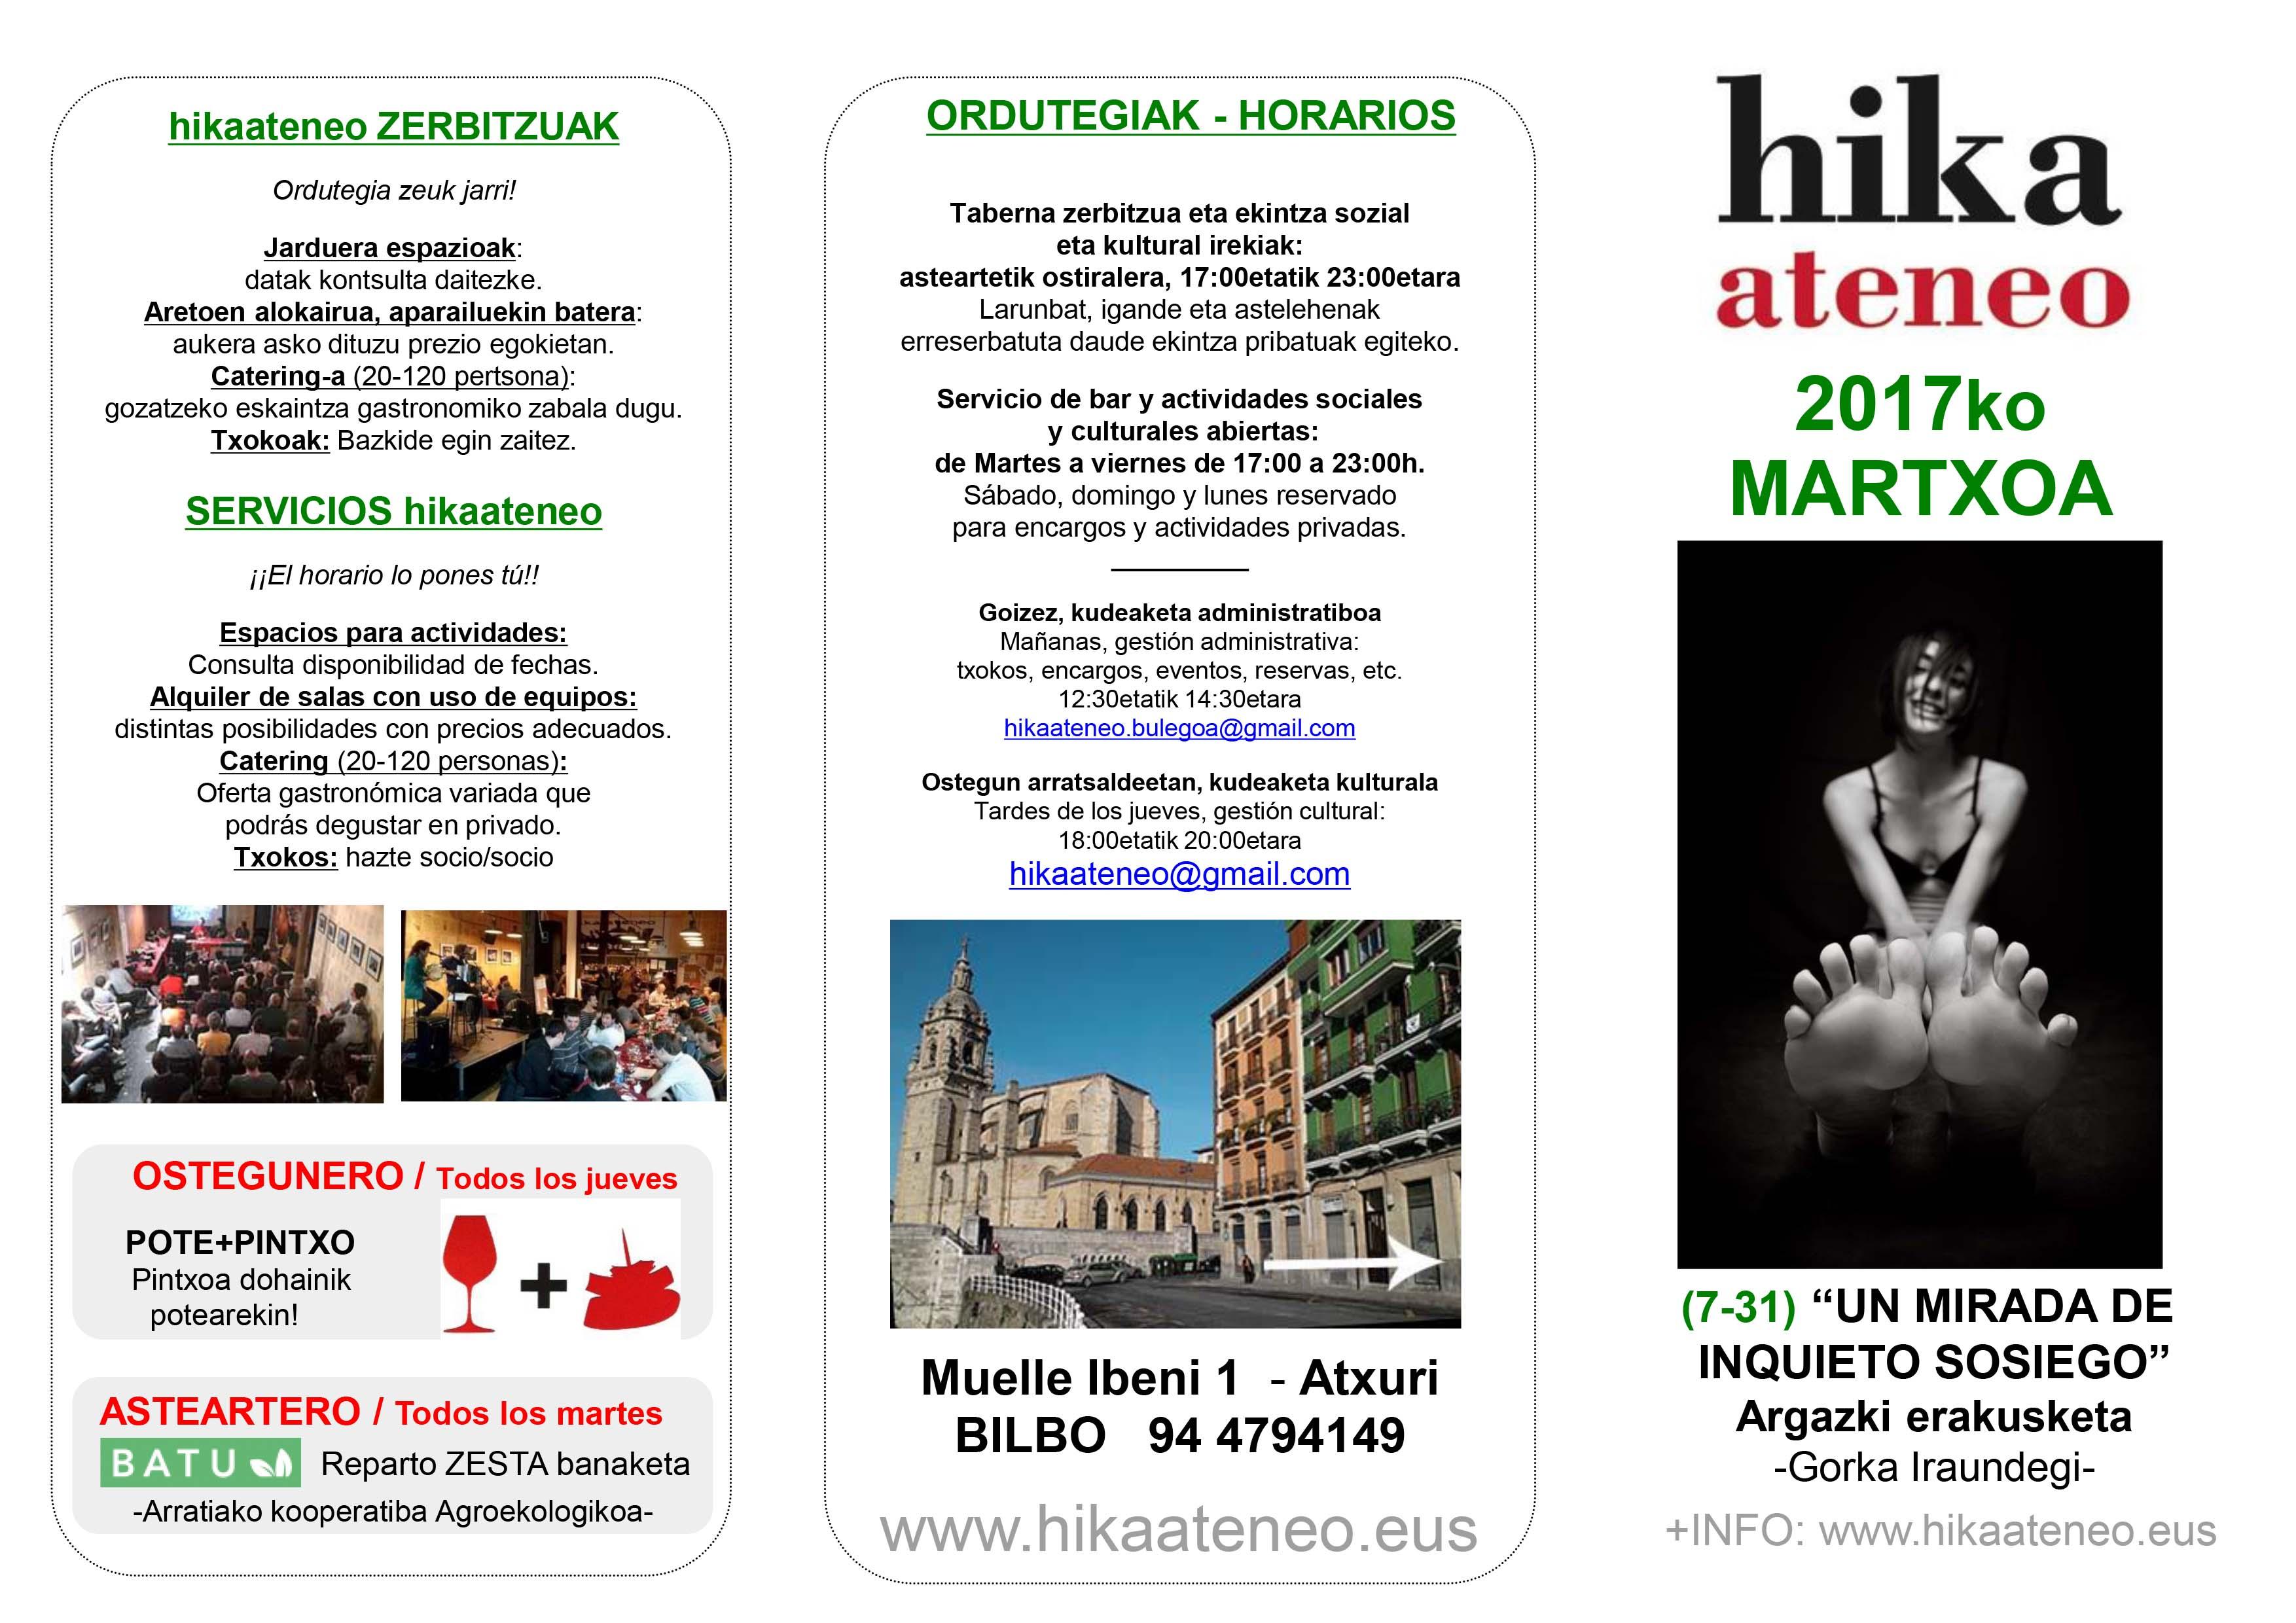 Agenda Hika Ateneo Bilbao Martxoak 2017 Marzo